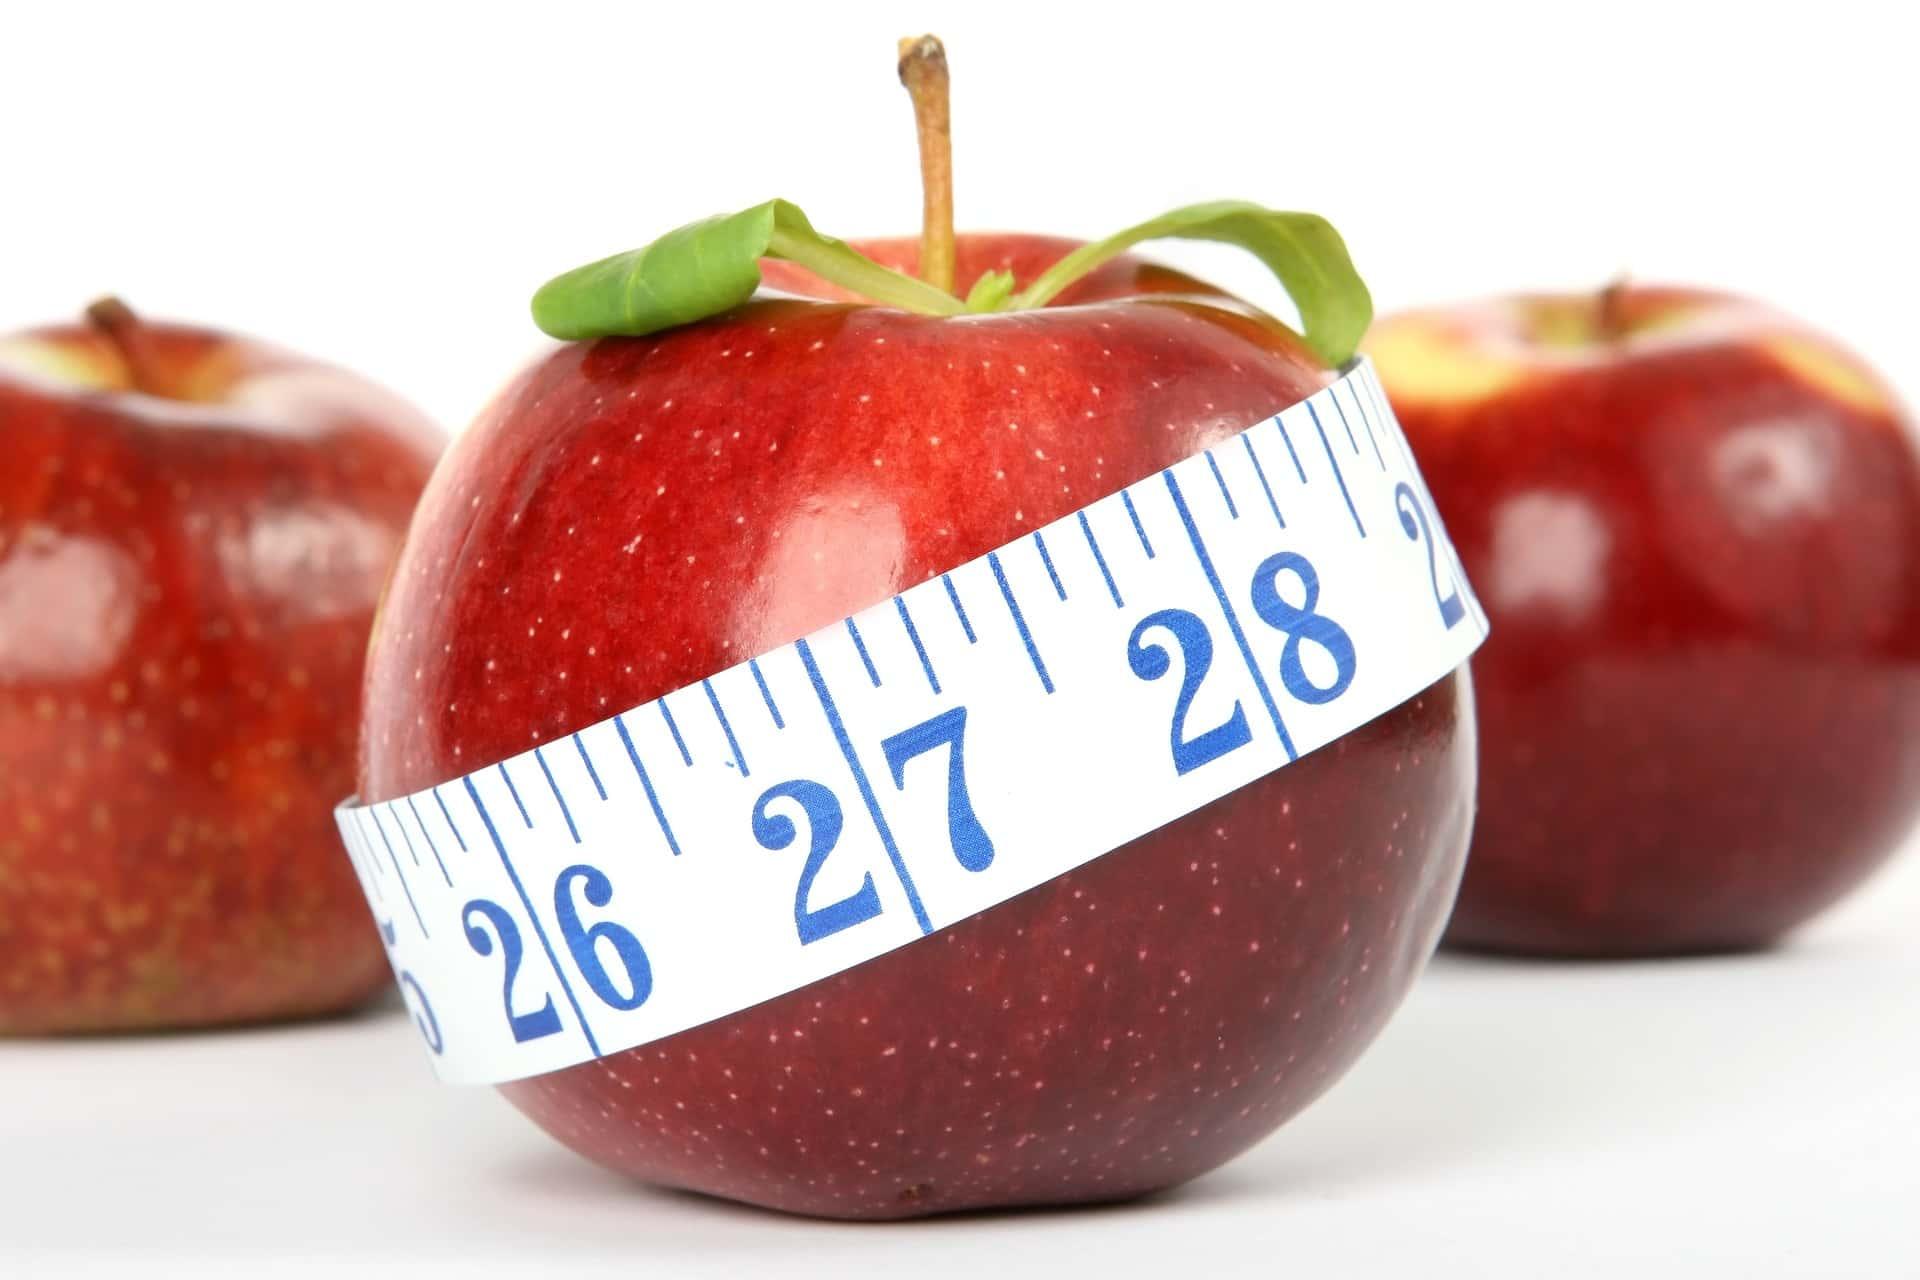 How to detox from sugar in 10 easy steps. Om Detox's easy sugar detox